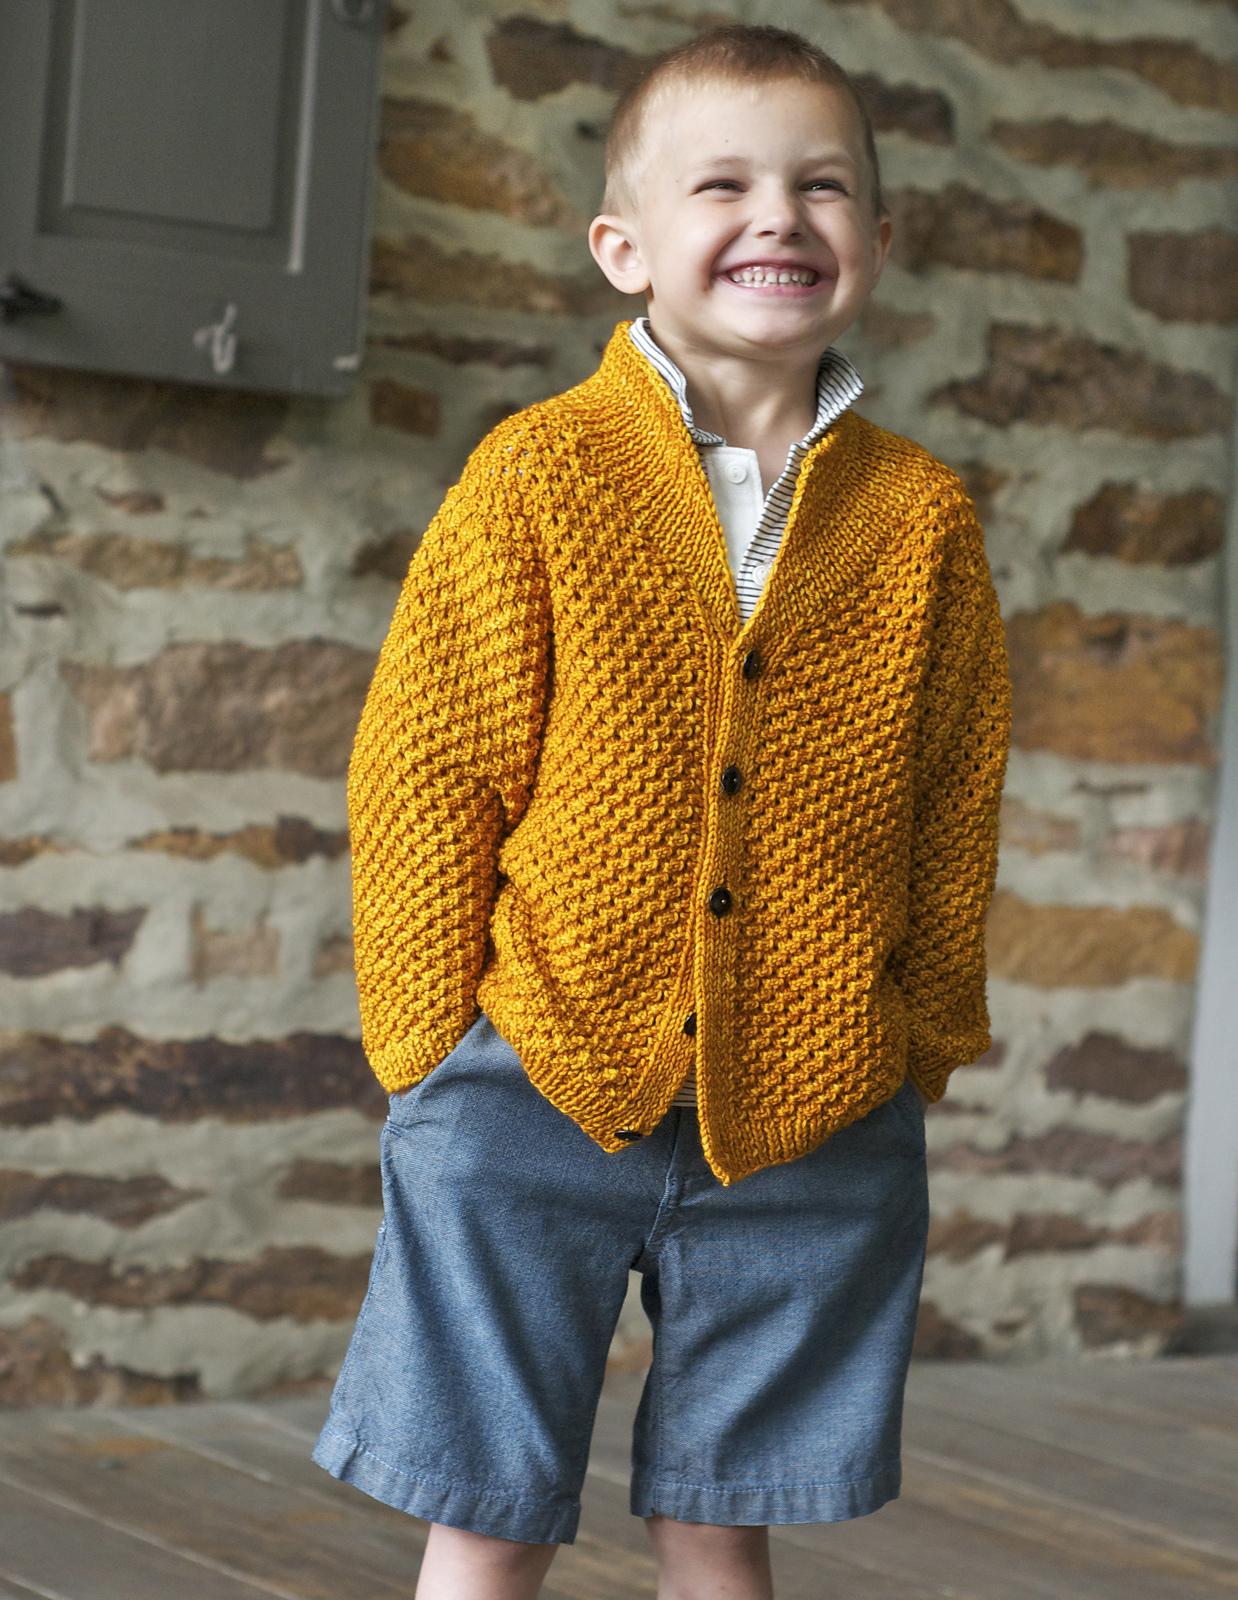 boys\' knitting patterns | Dark Matter Knits